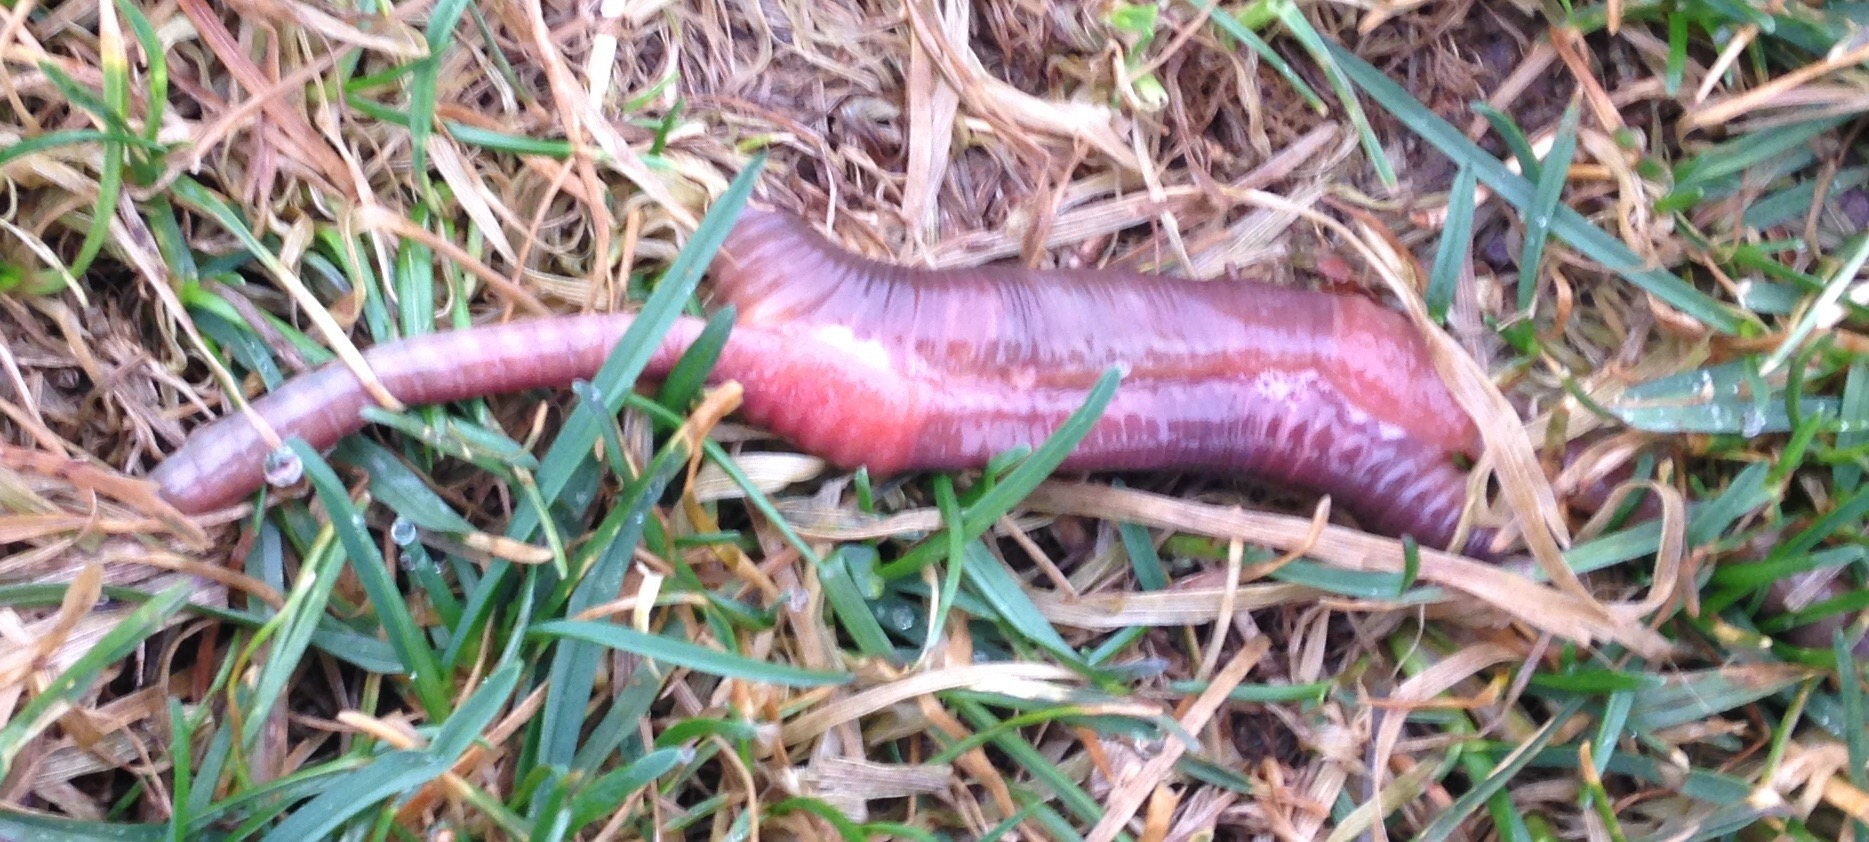 worm giving birth